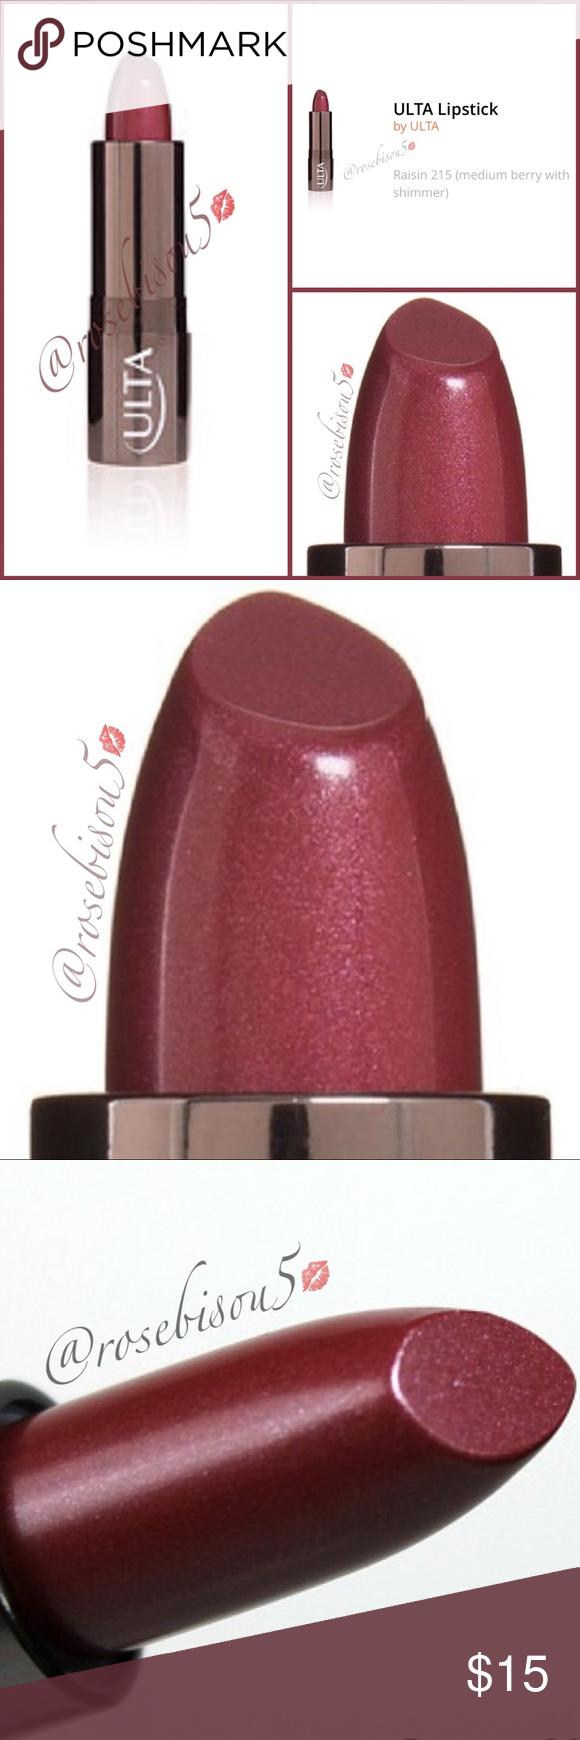 Ulta RAISIN 215 Lipstick (Retired, Ltd.) Ulta lipstick